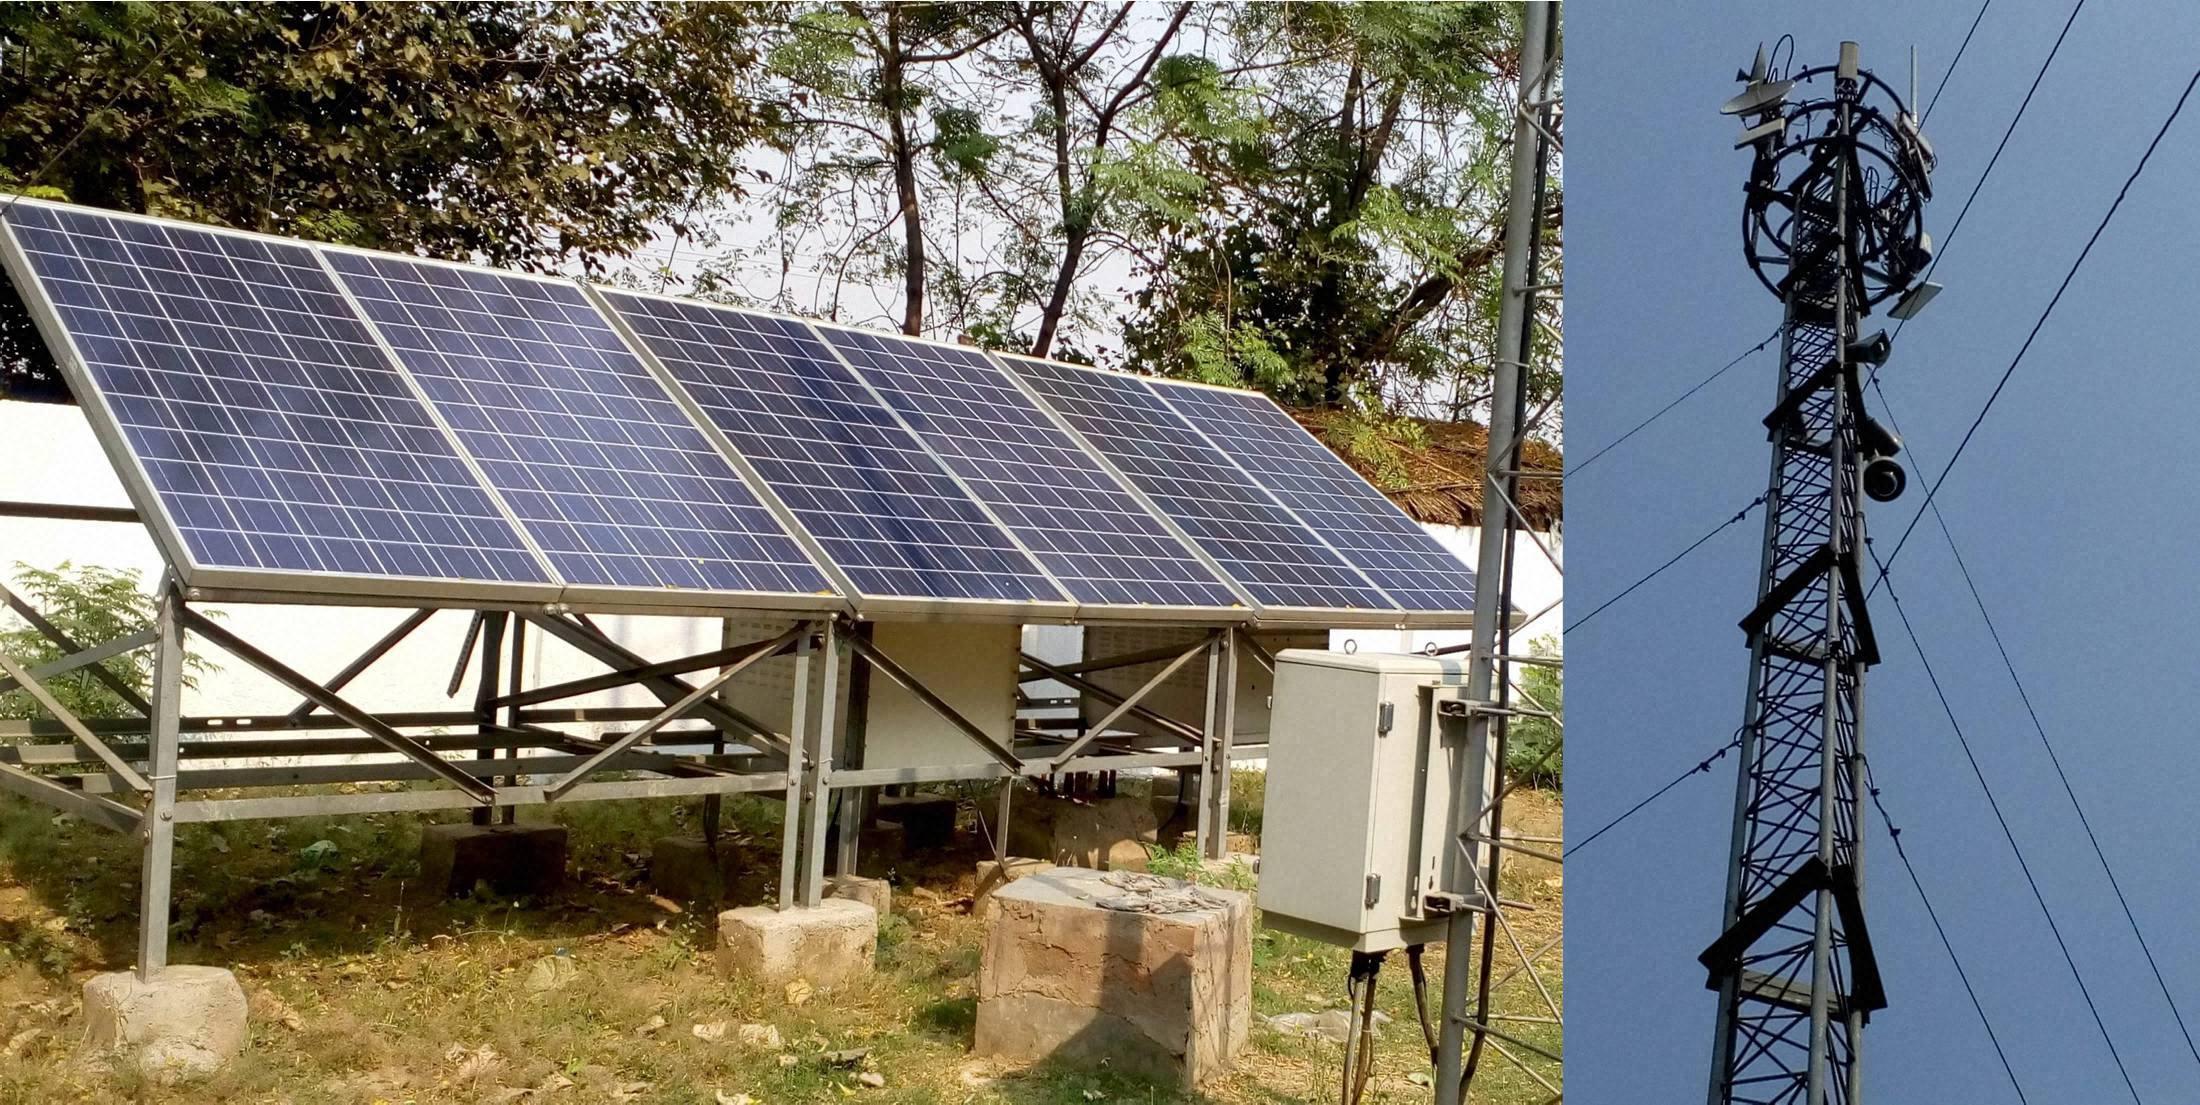 Rajasthan villages realising 'Digital India' dream on solar power